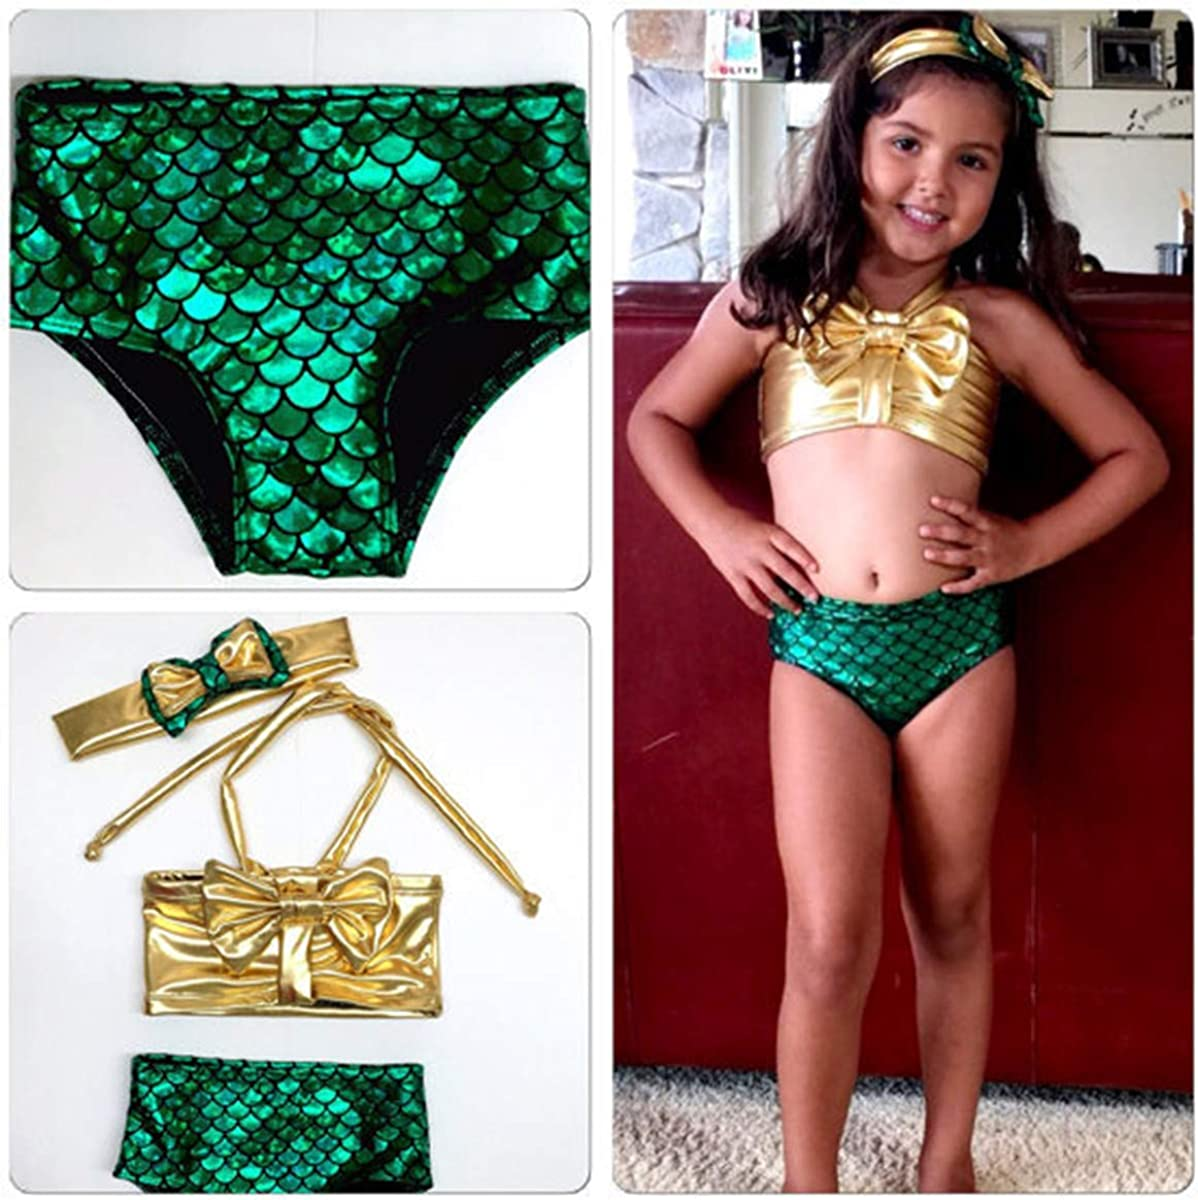 Baby Kids Girl Mermaid Swimsuit Halter Bikini Swimwear Beach Wear 3pcs Outfits